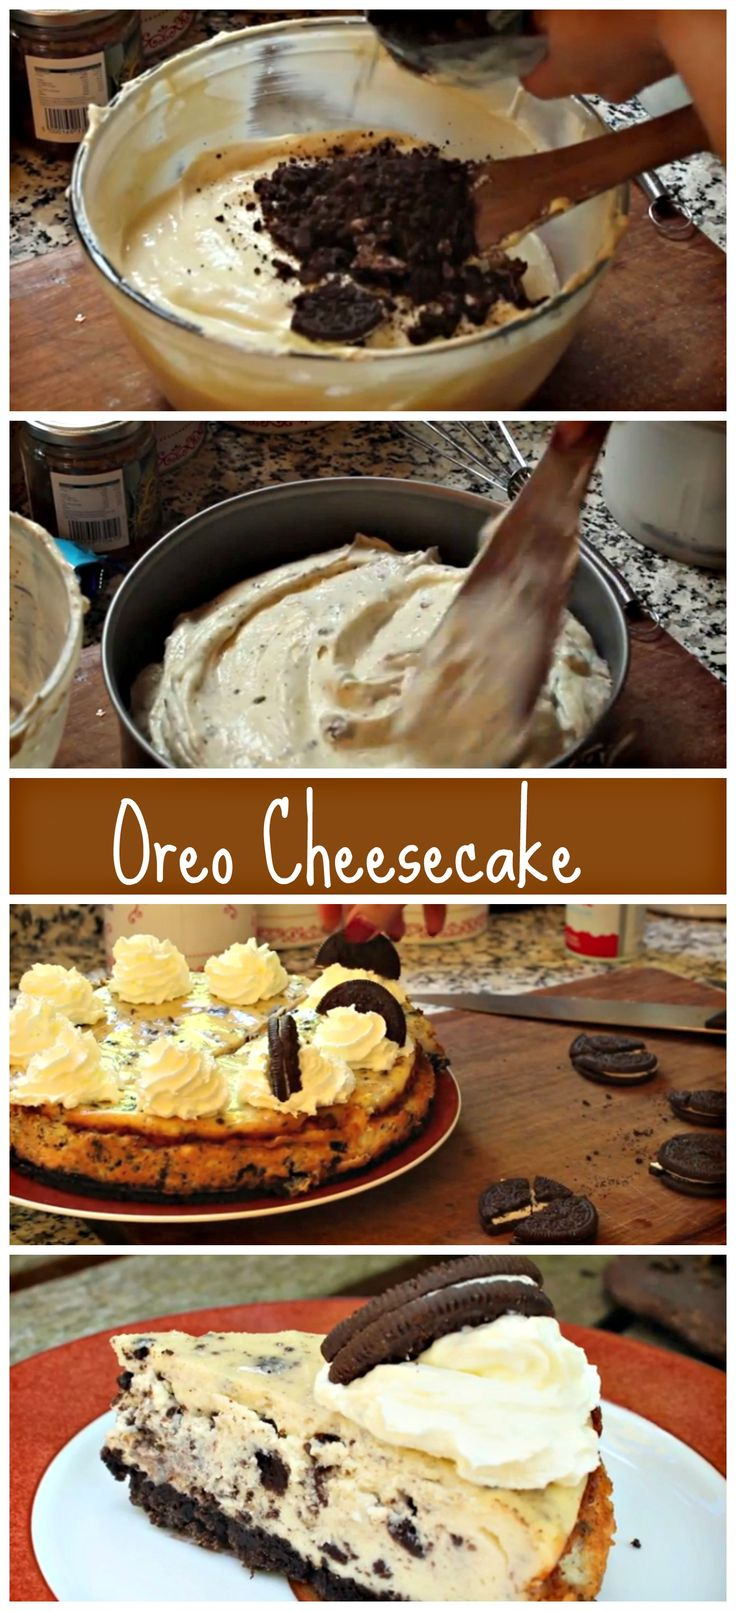 Super decadent Oreo Cheesecake. http://www.ifood.tv/recipe/how-to-make-oreo-cheesecake